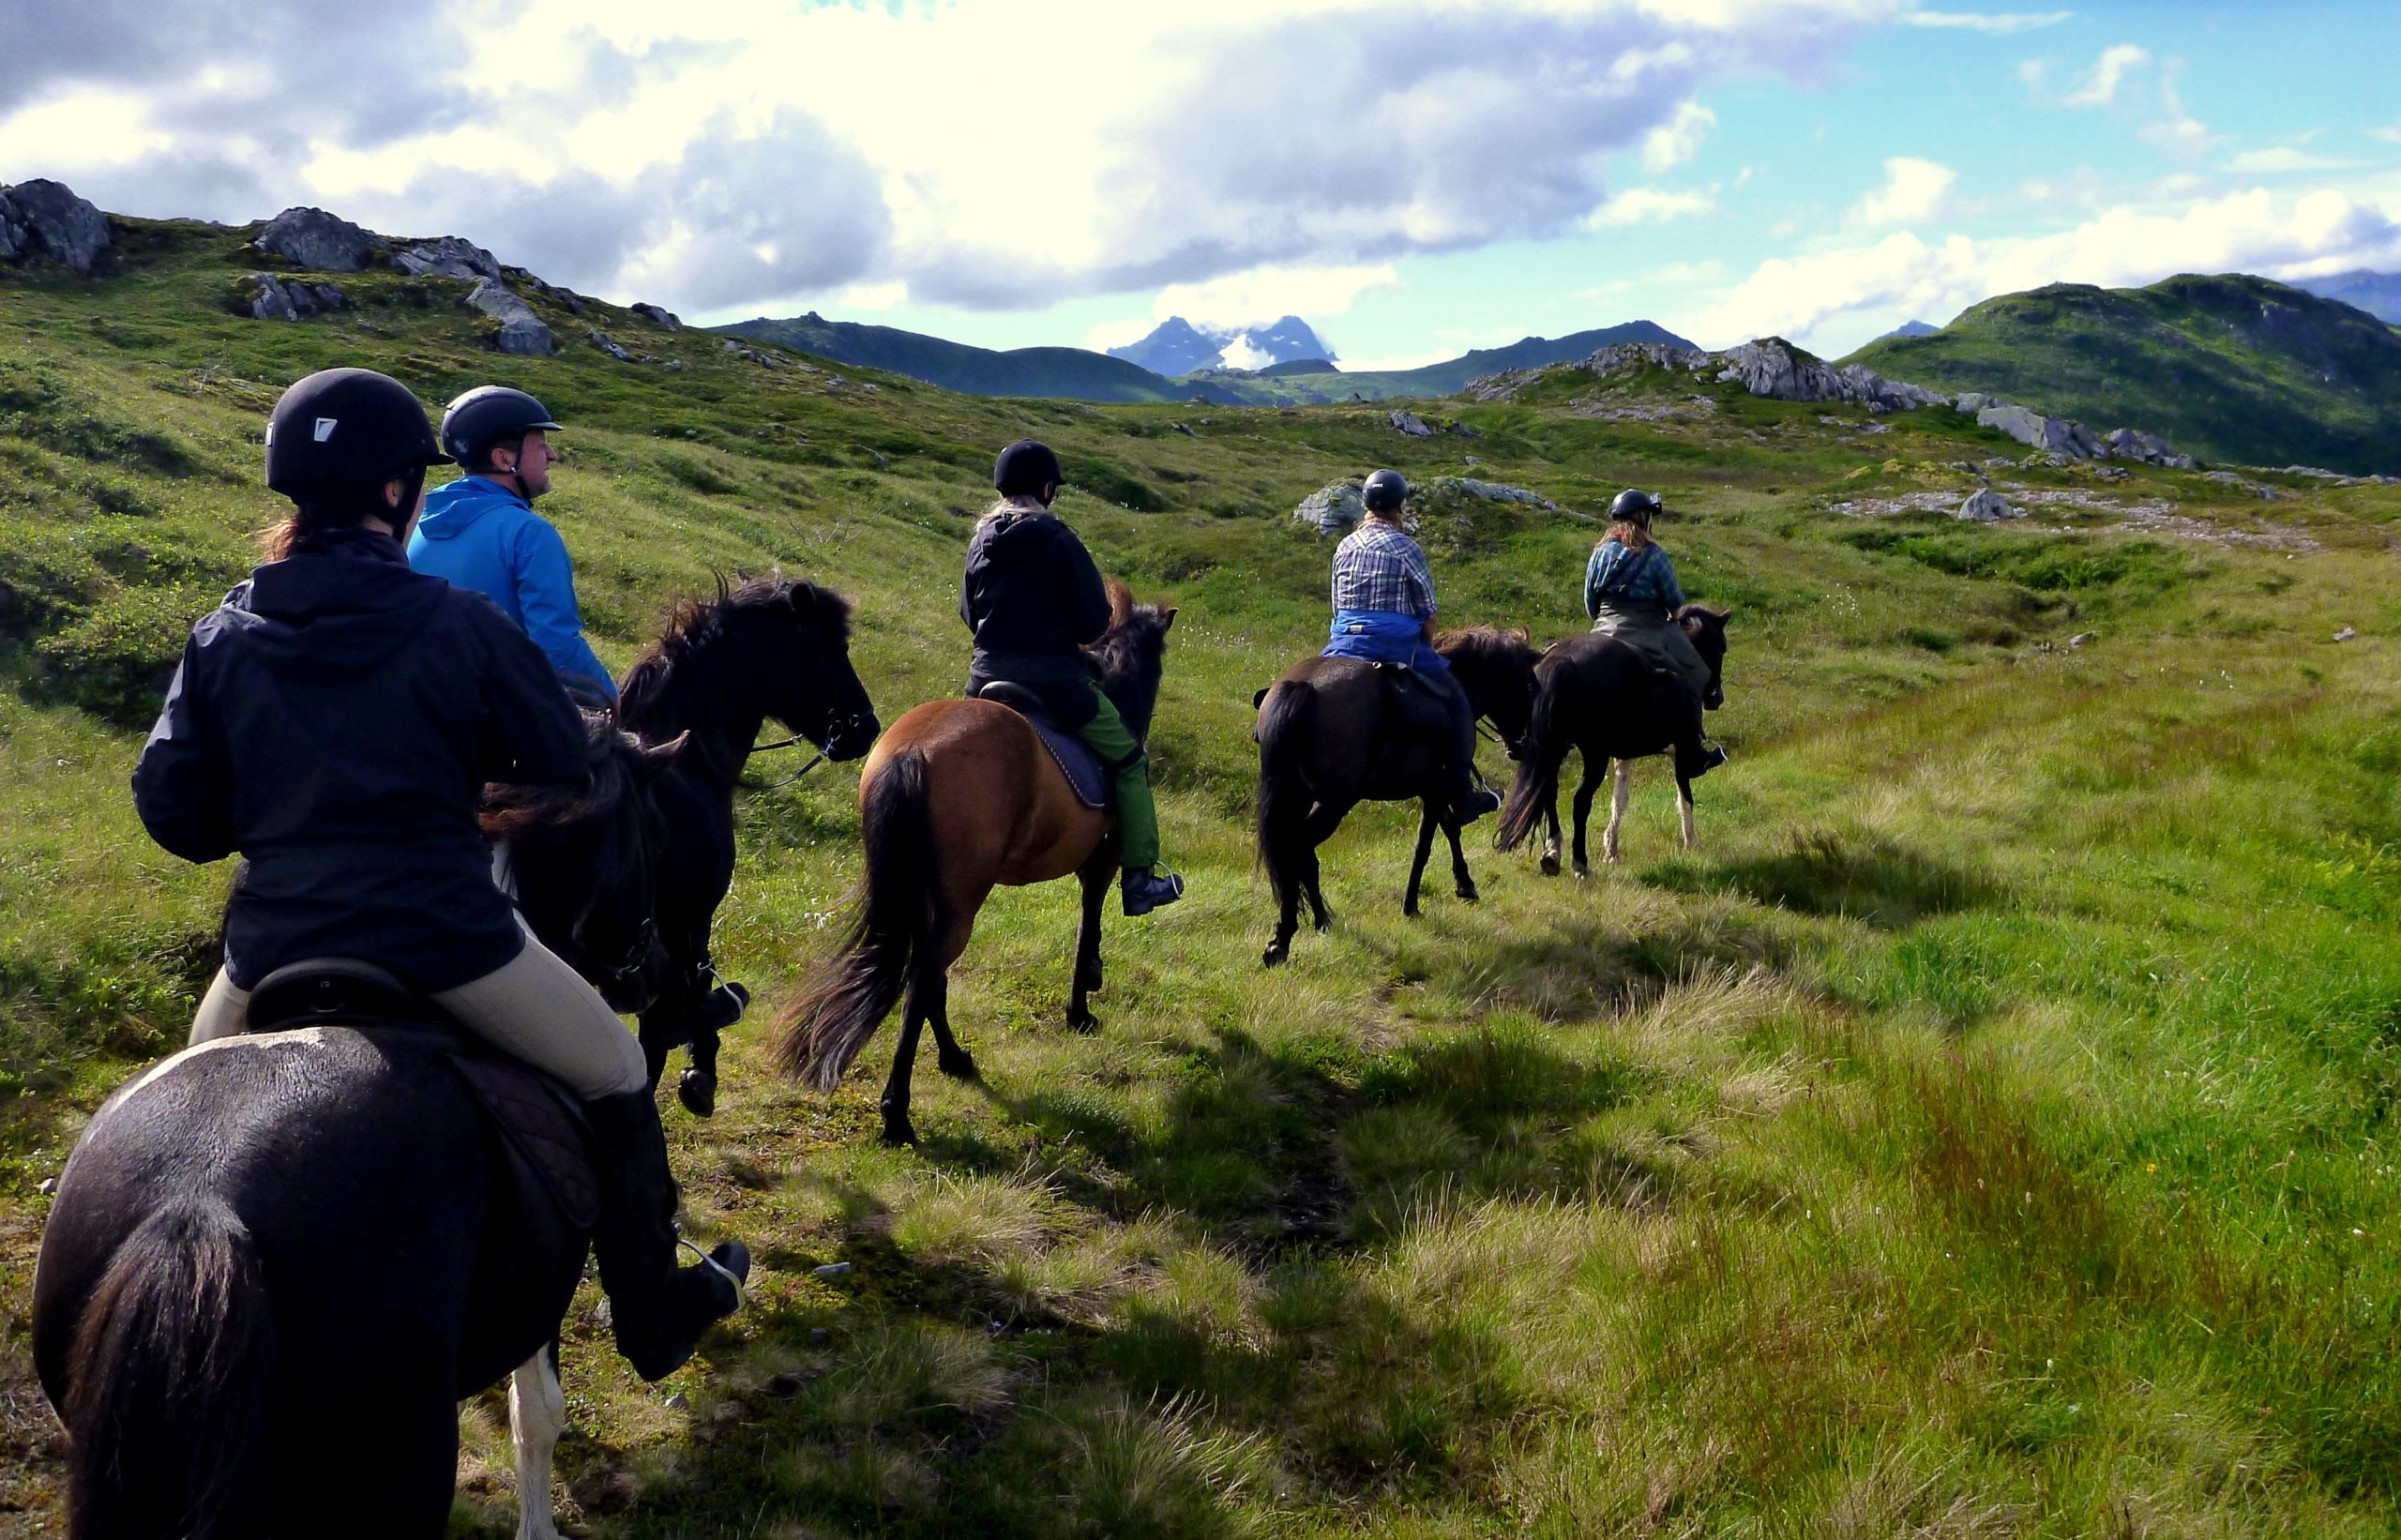 Opplev Lofoten til hest en helg i sommer eller til høsten!